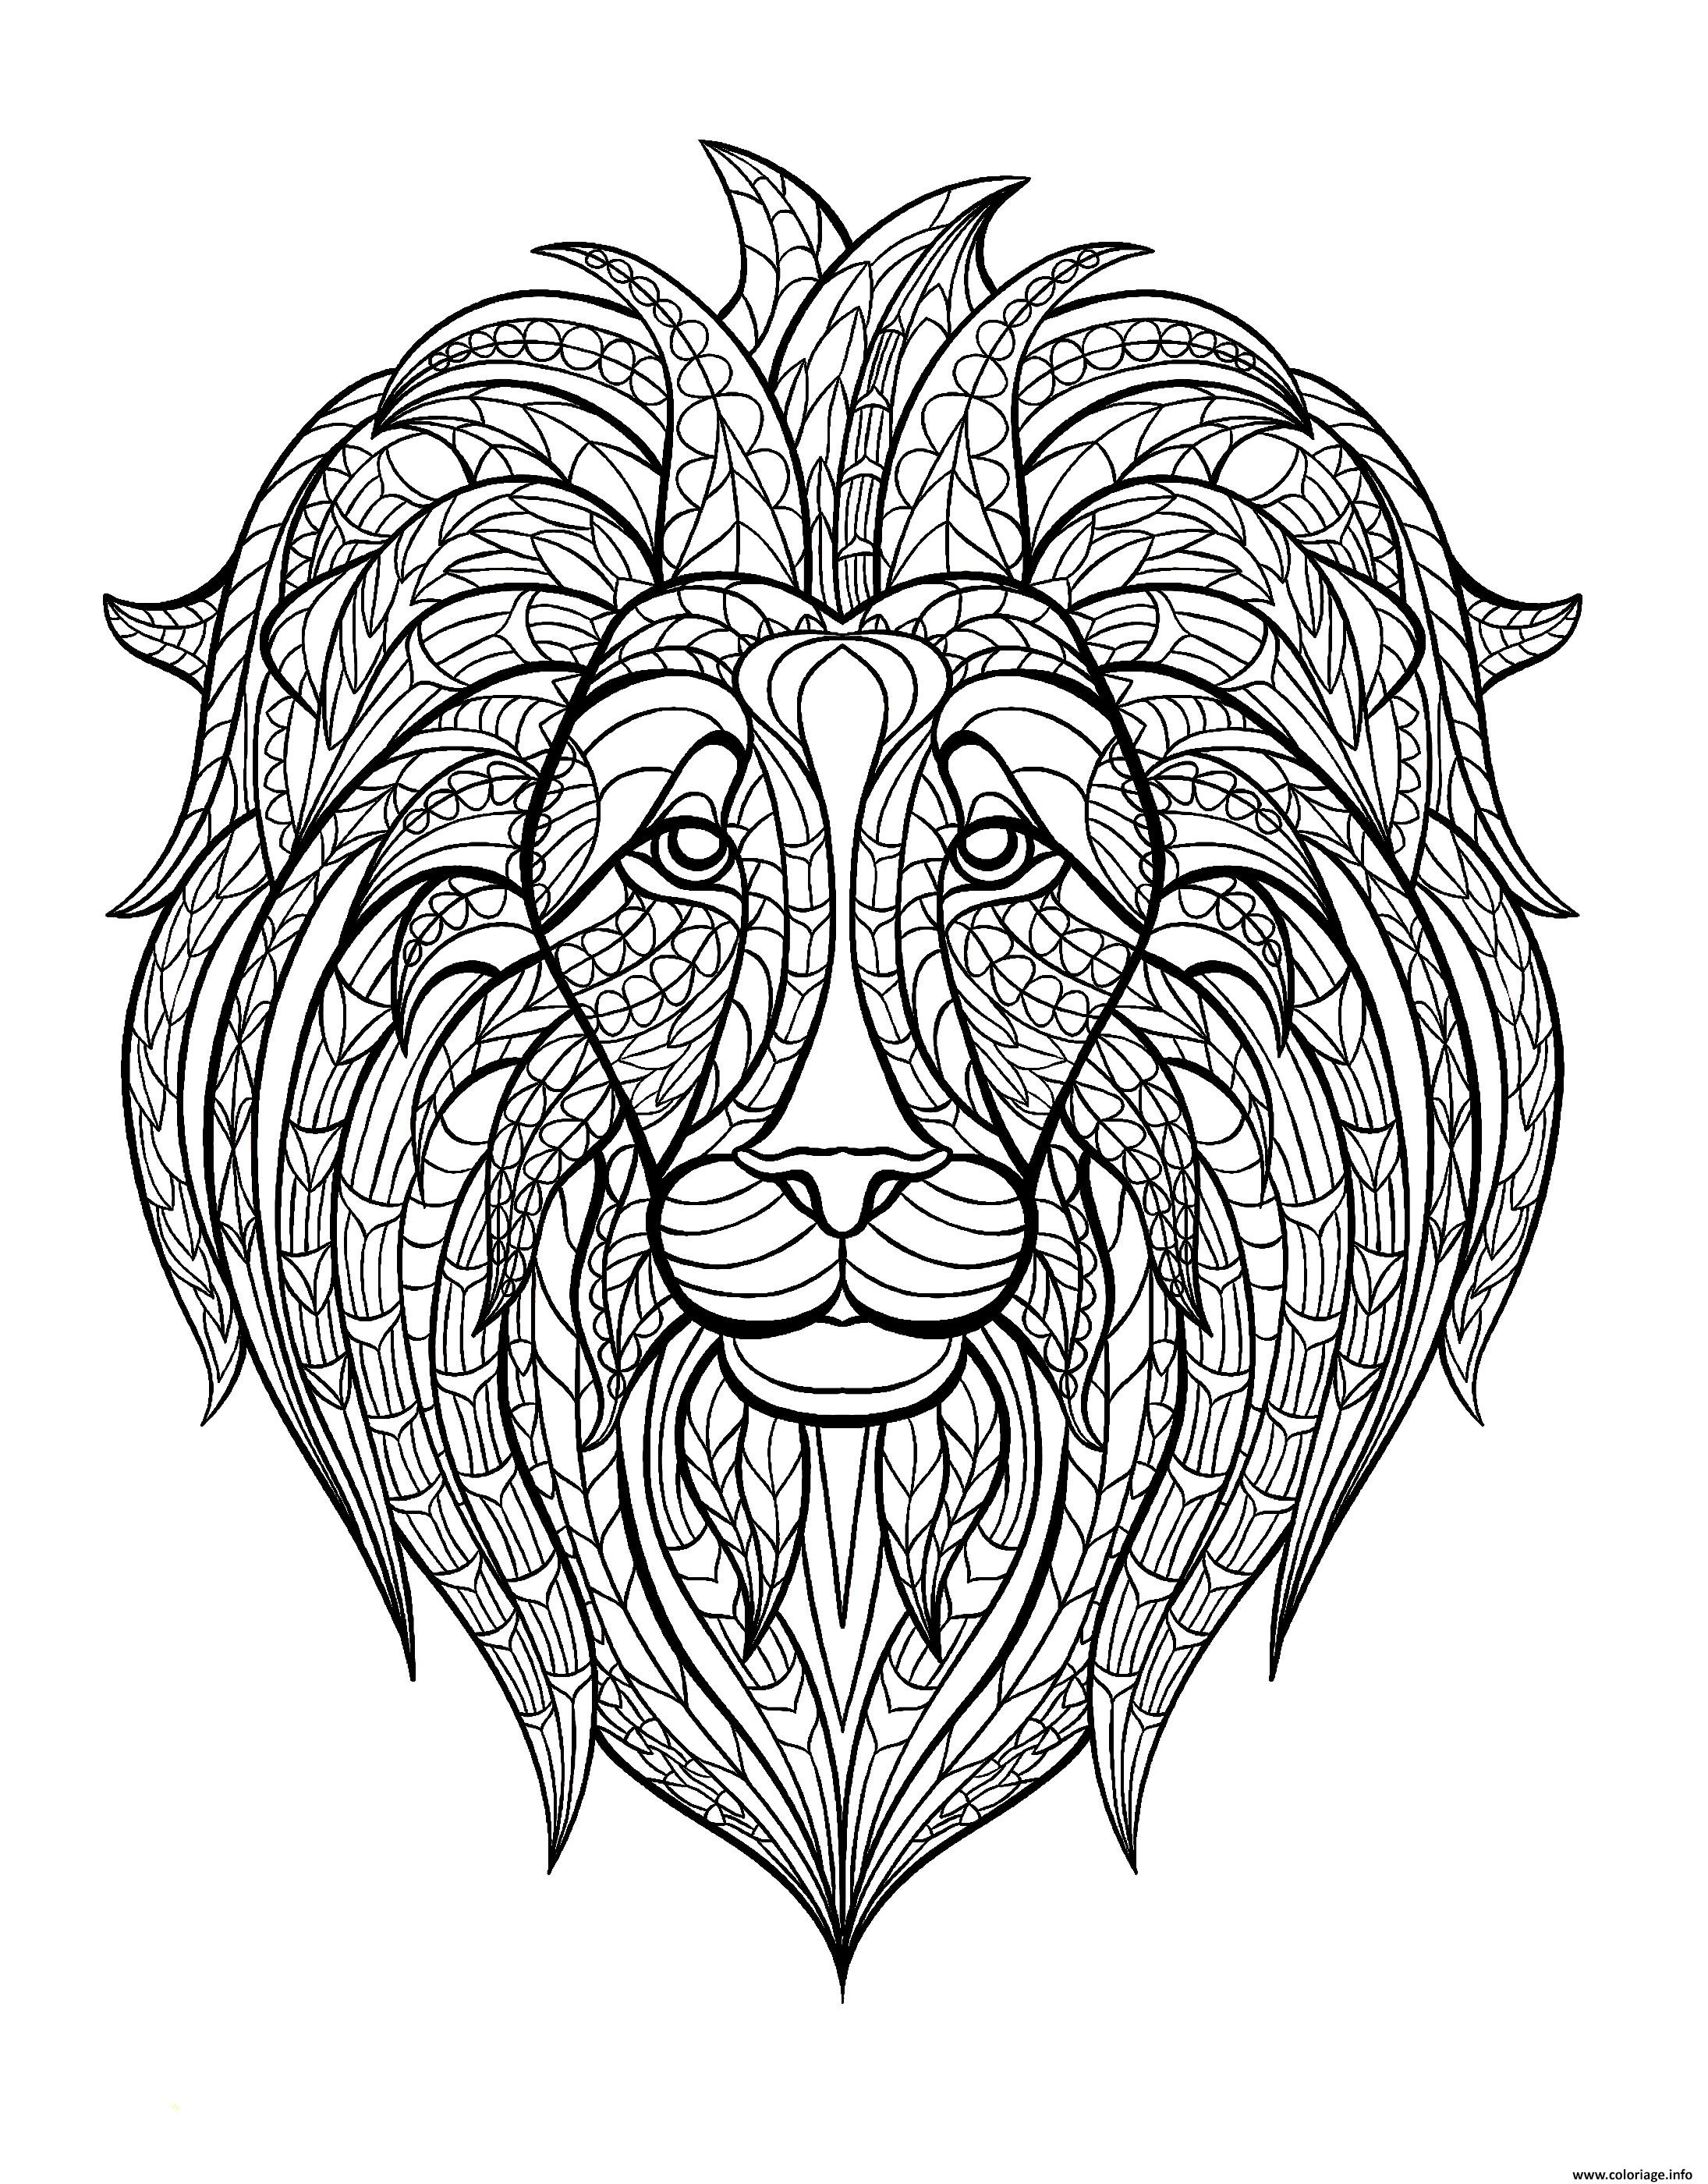 Coloriage Adulte Tete Lion Jecolorie Com